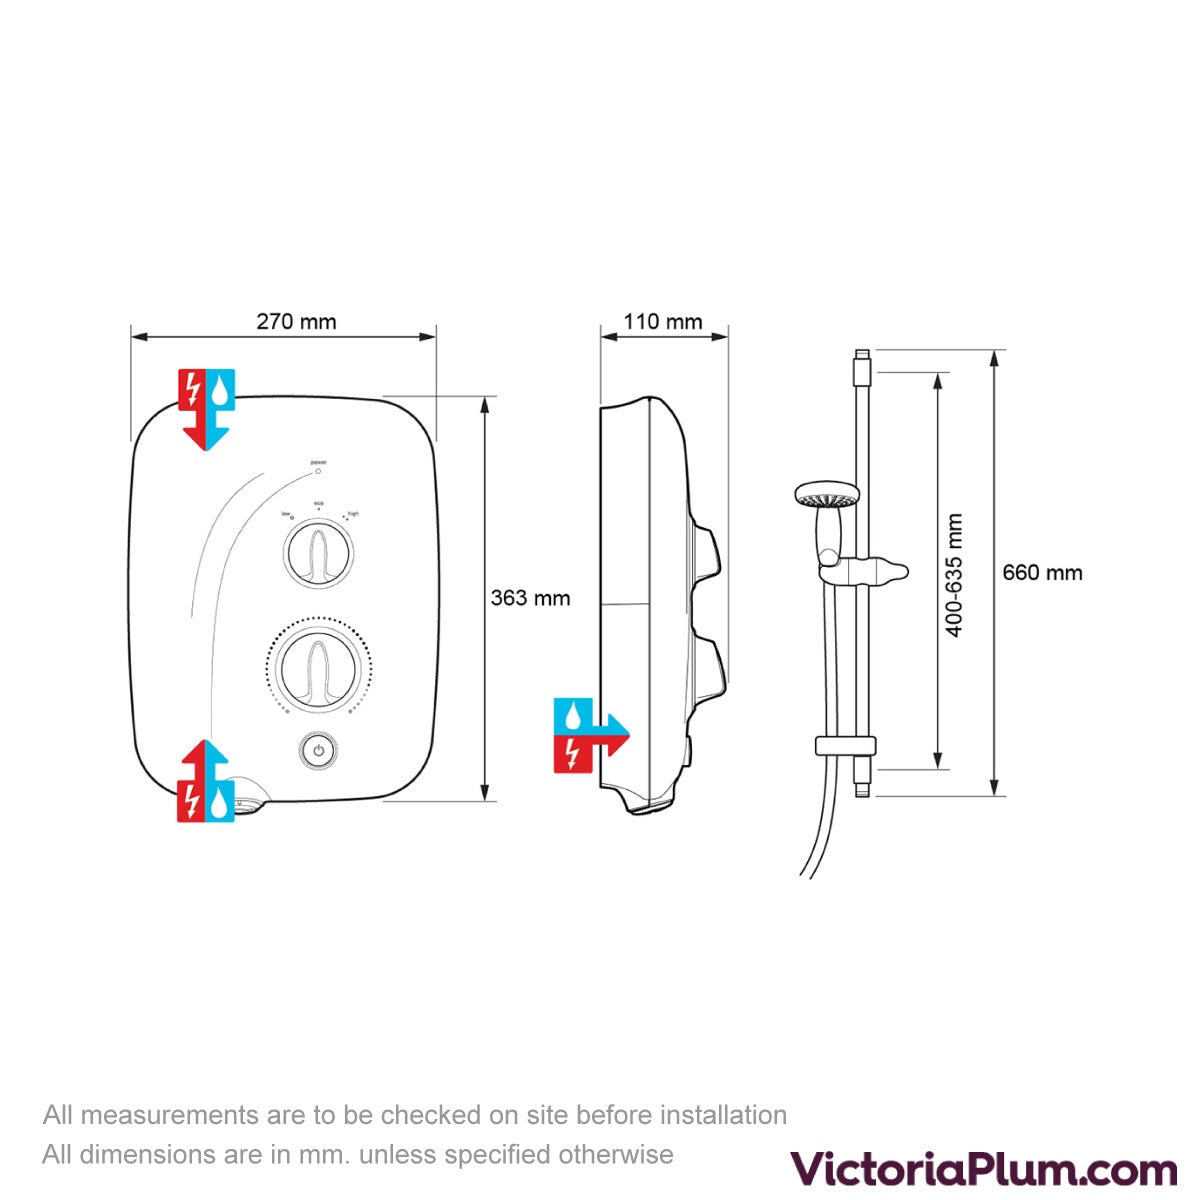 Dimensions for Mira Elite QT 9.8kw pumped electric shower